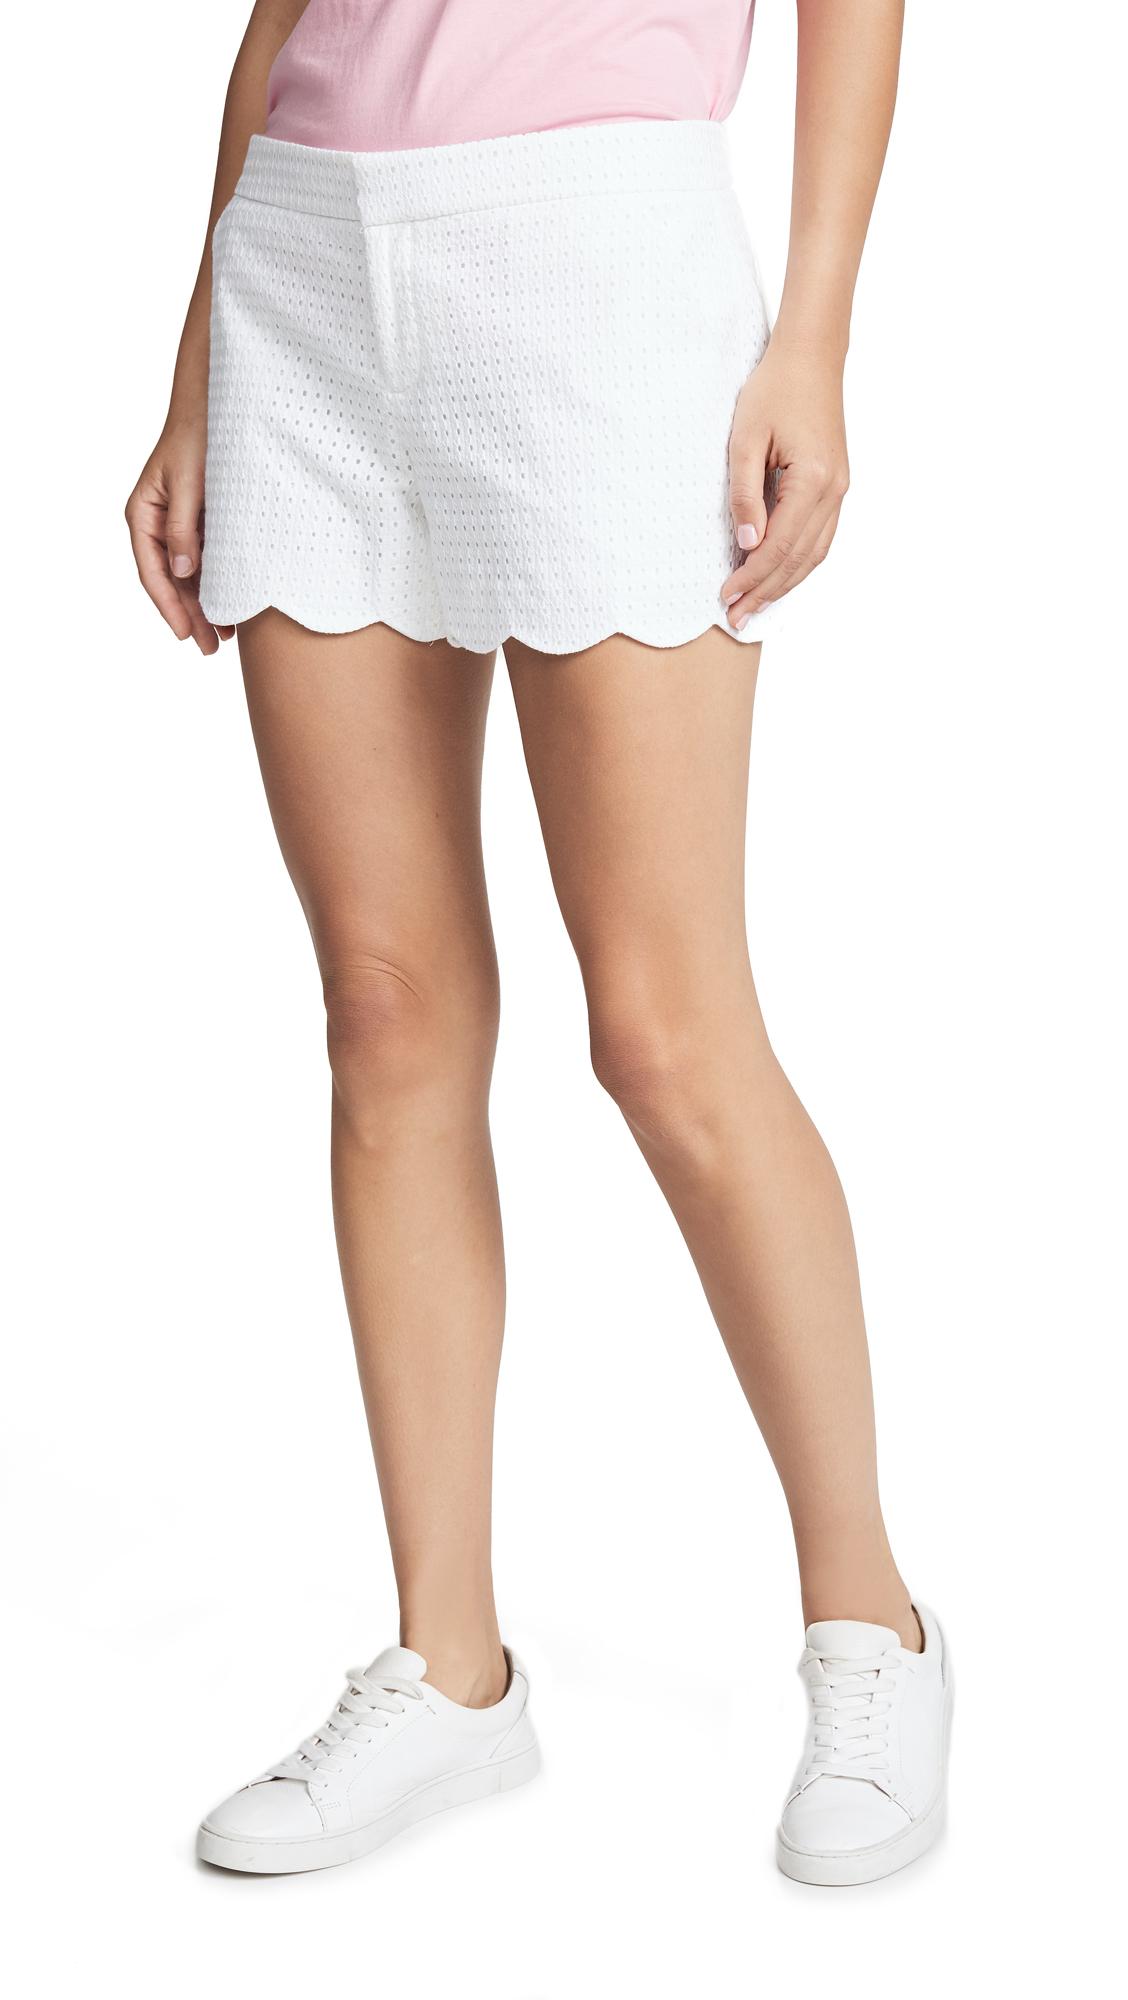 Club Monaco Amber Shorts - White